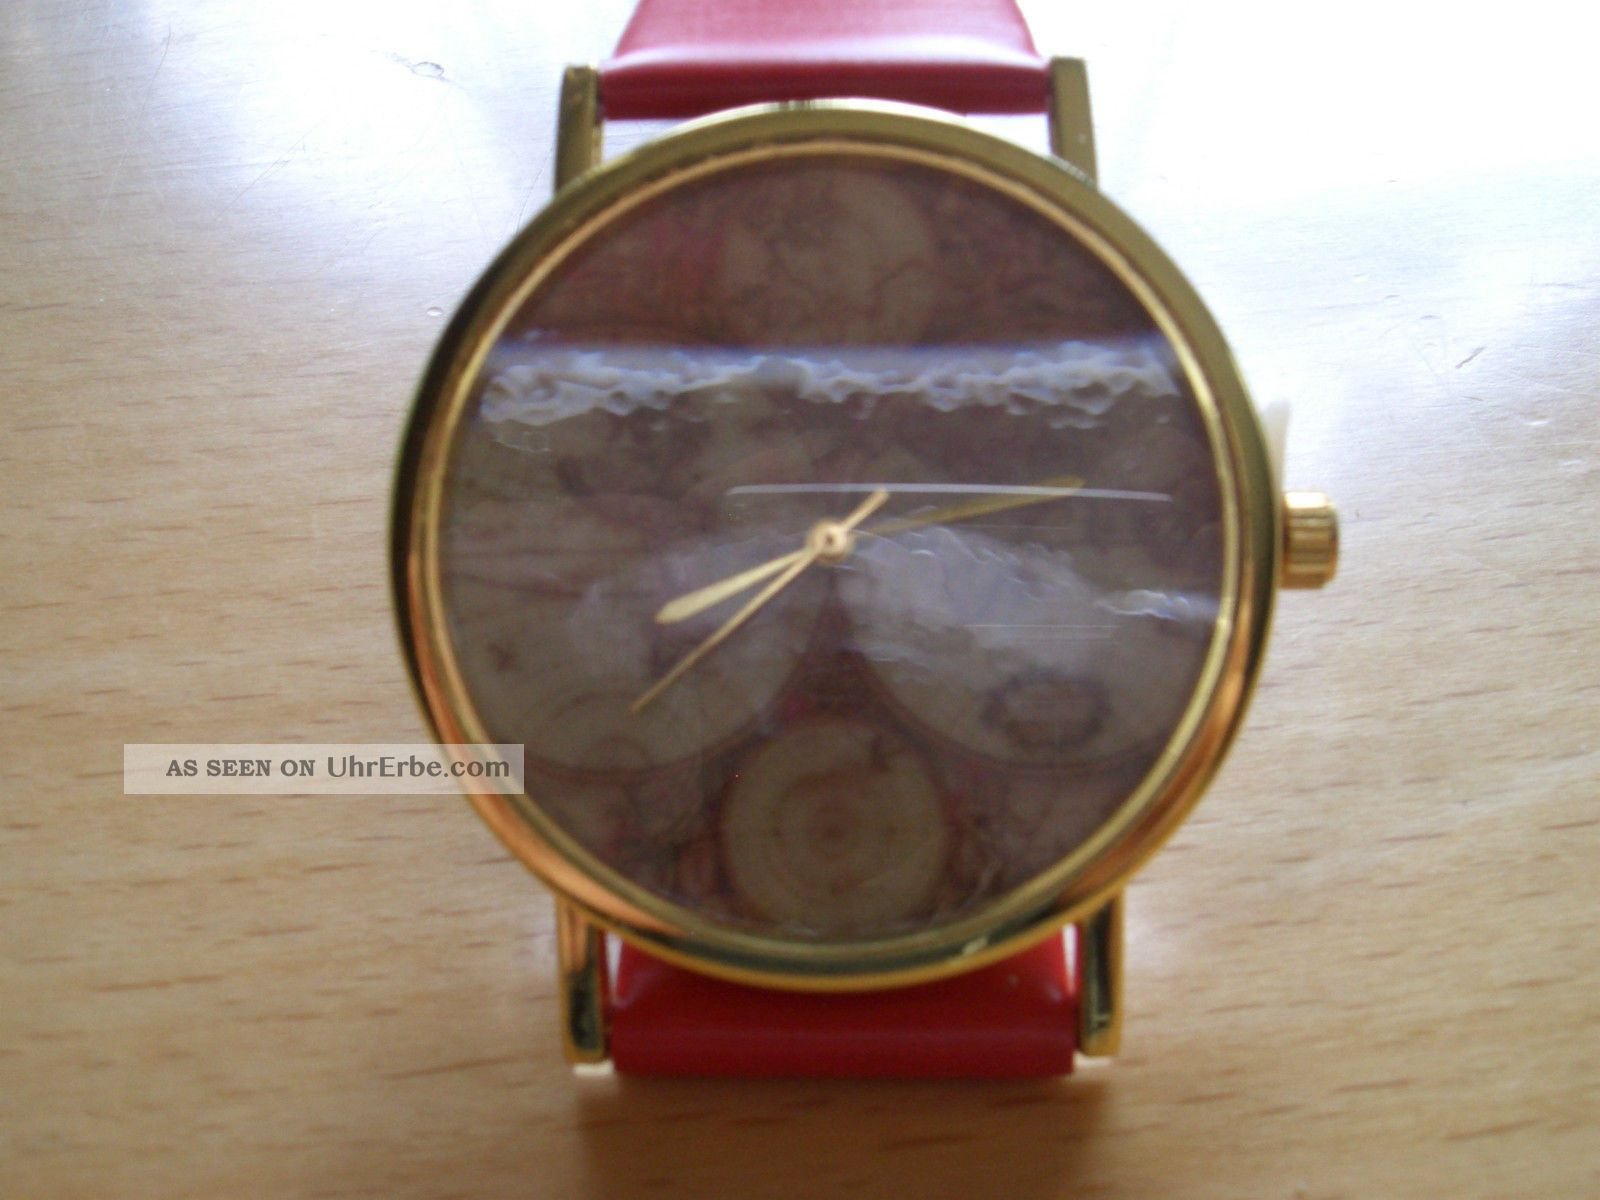 Damenuhr Antik Herrenuhr Weltkarte Retro Rot Armbanduhr Gold Unisex Uhr SjqUzVGLMp